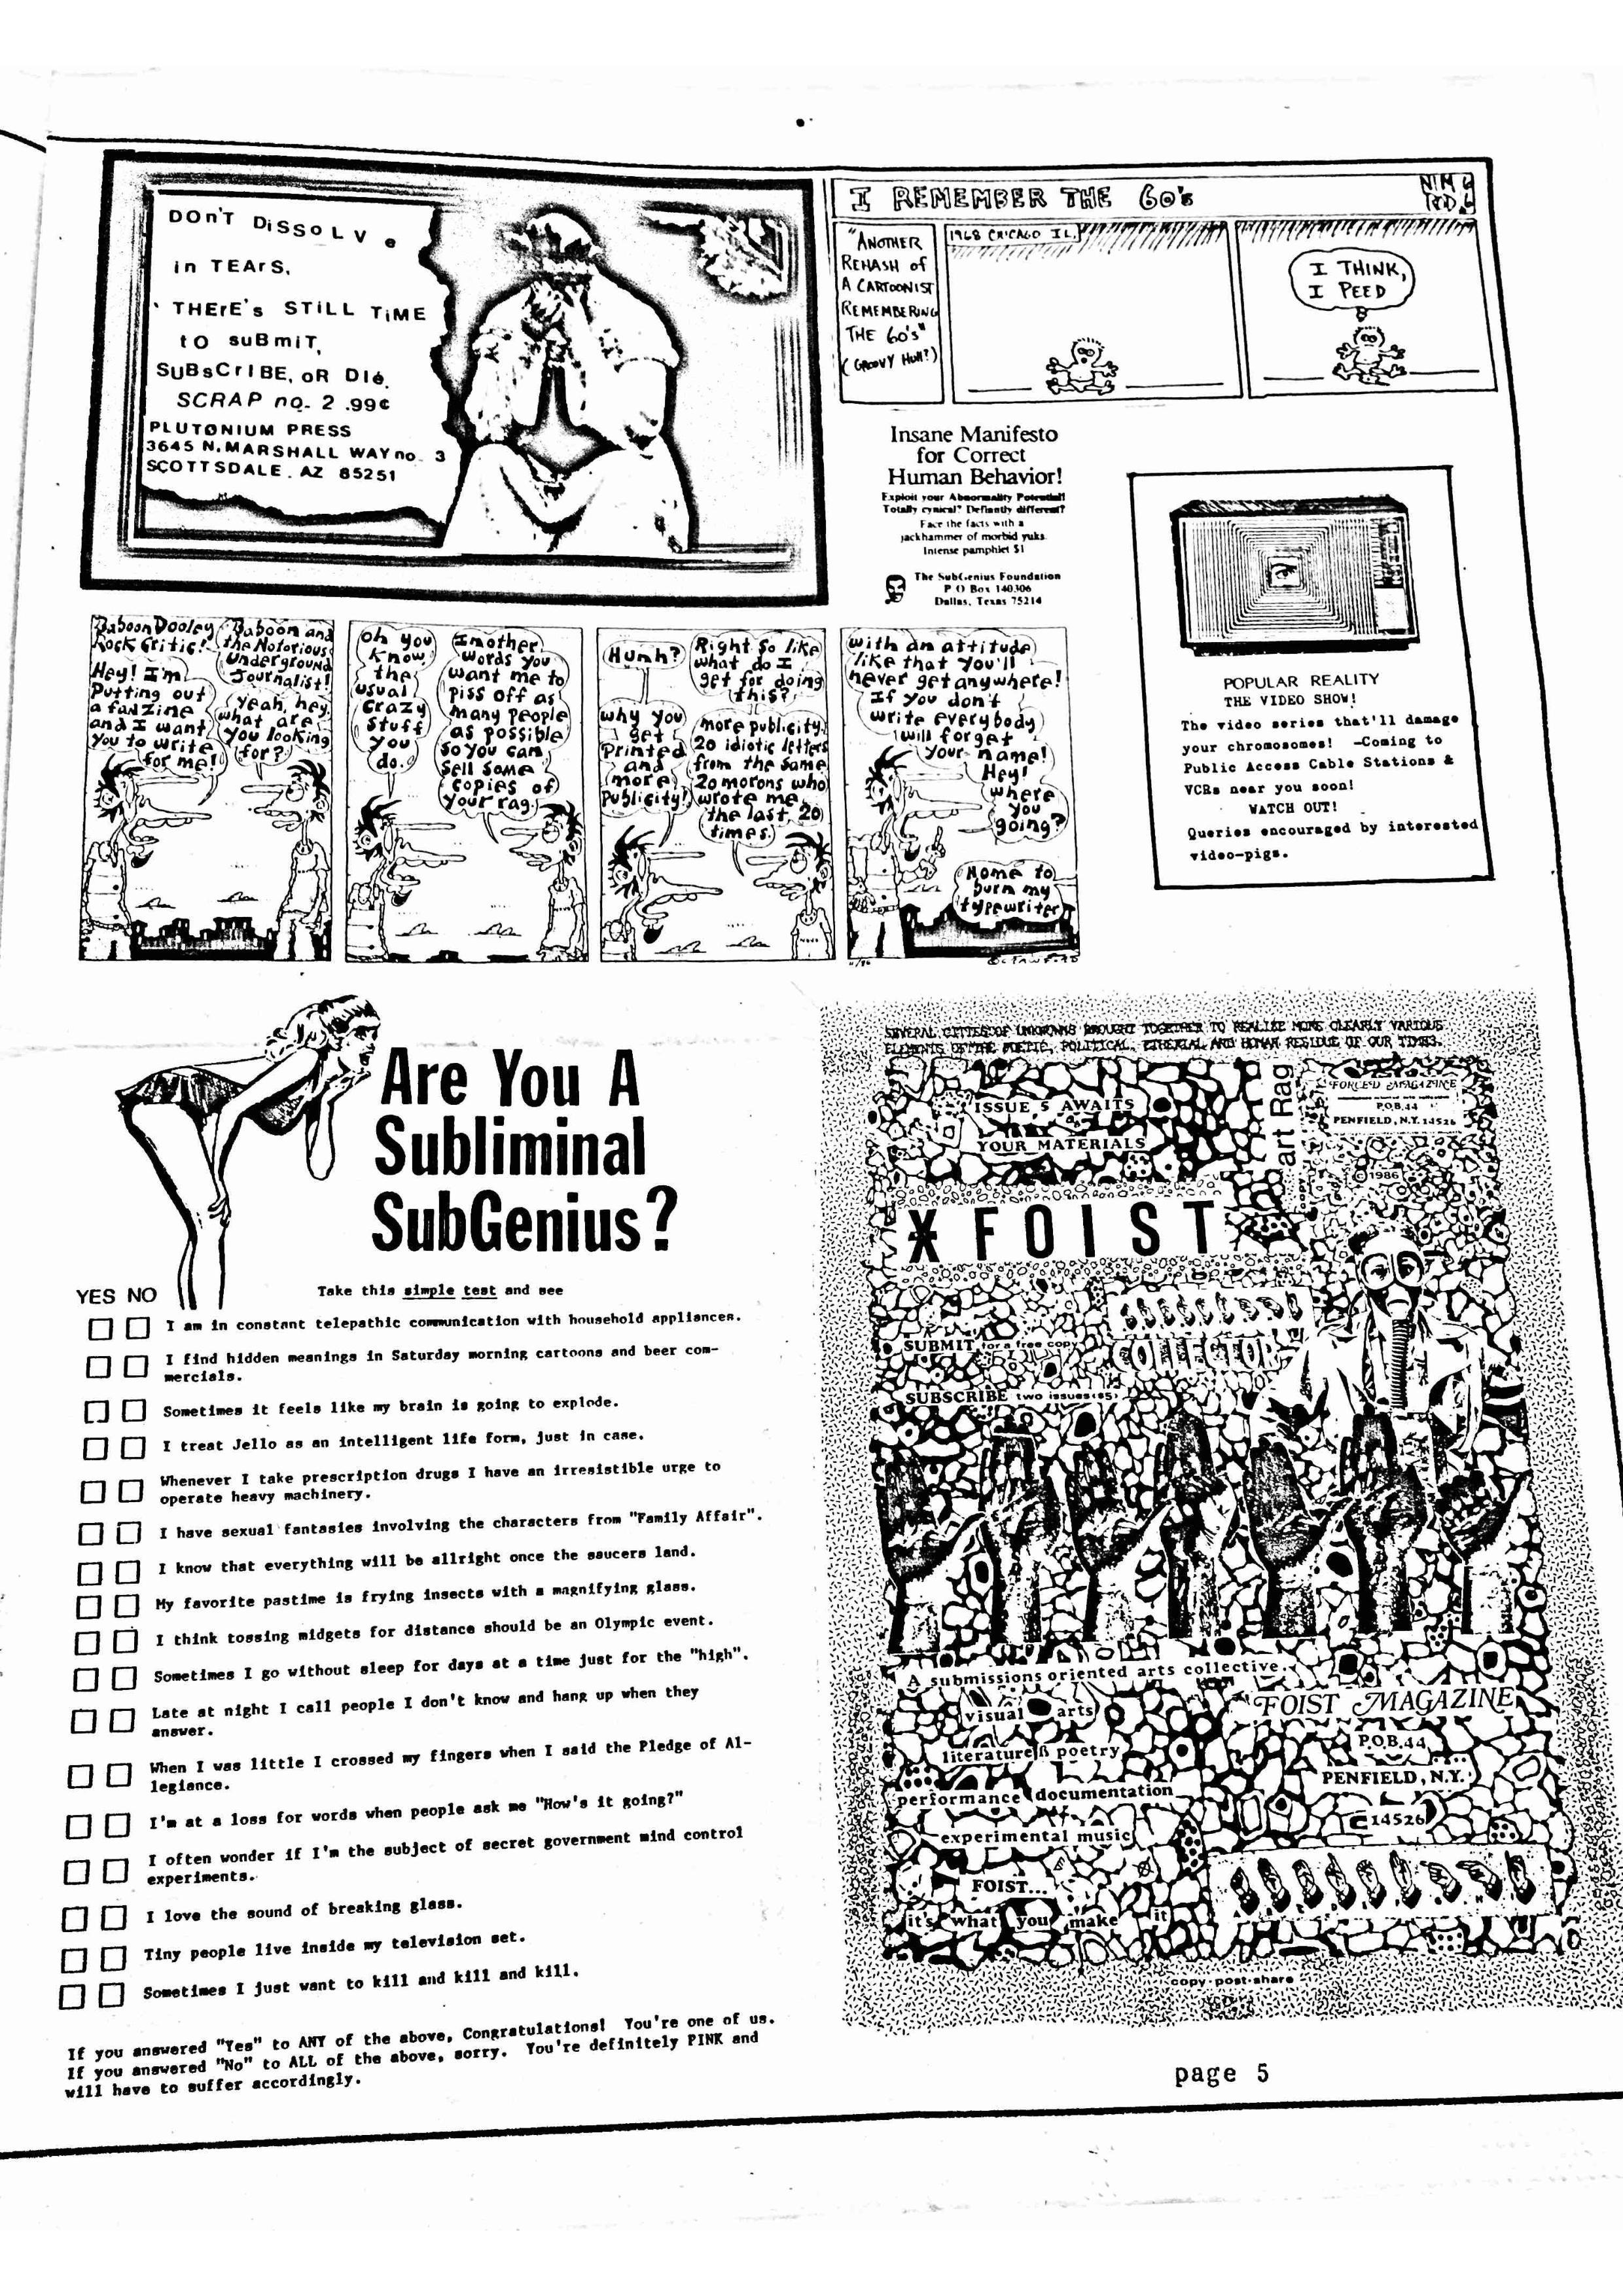 PopRealNo16-page-005.jpg